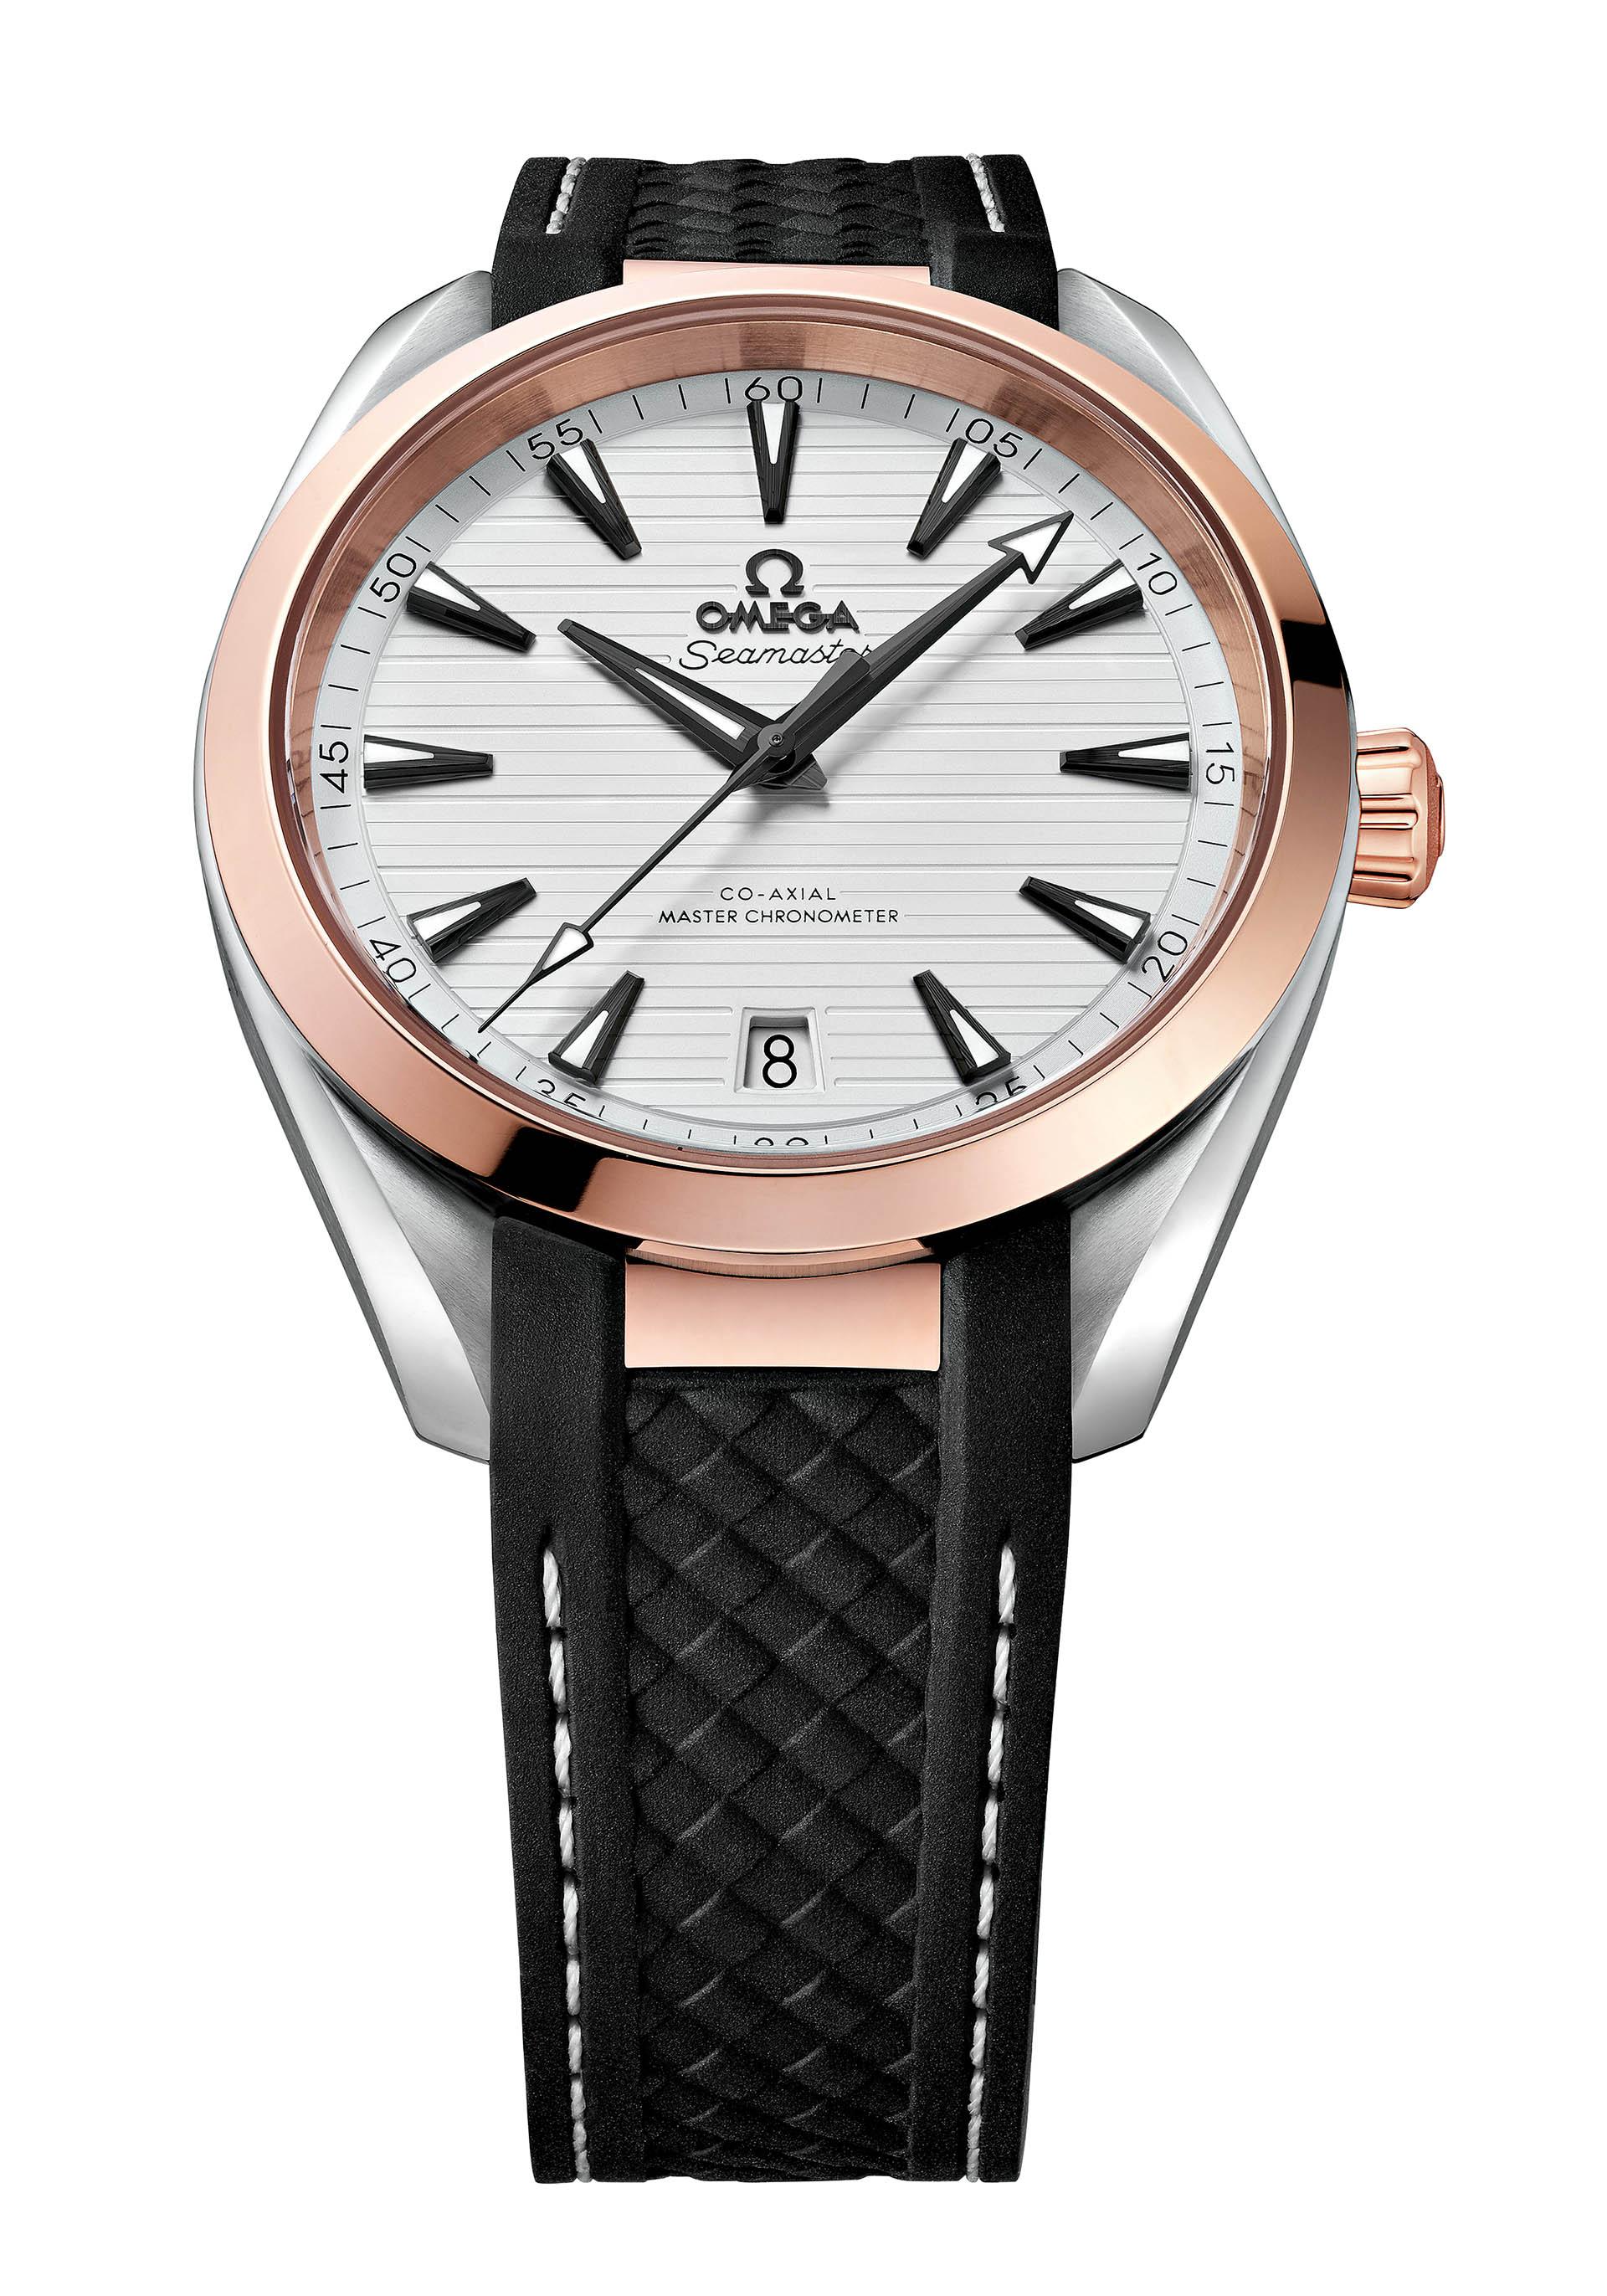 Omega Seamaster Aqua Terra Master Chronometer.